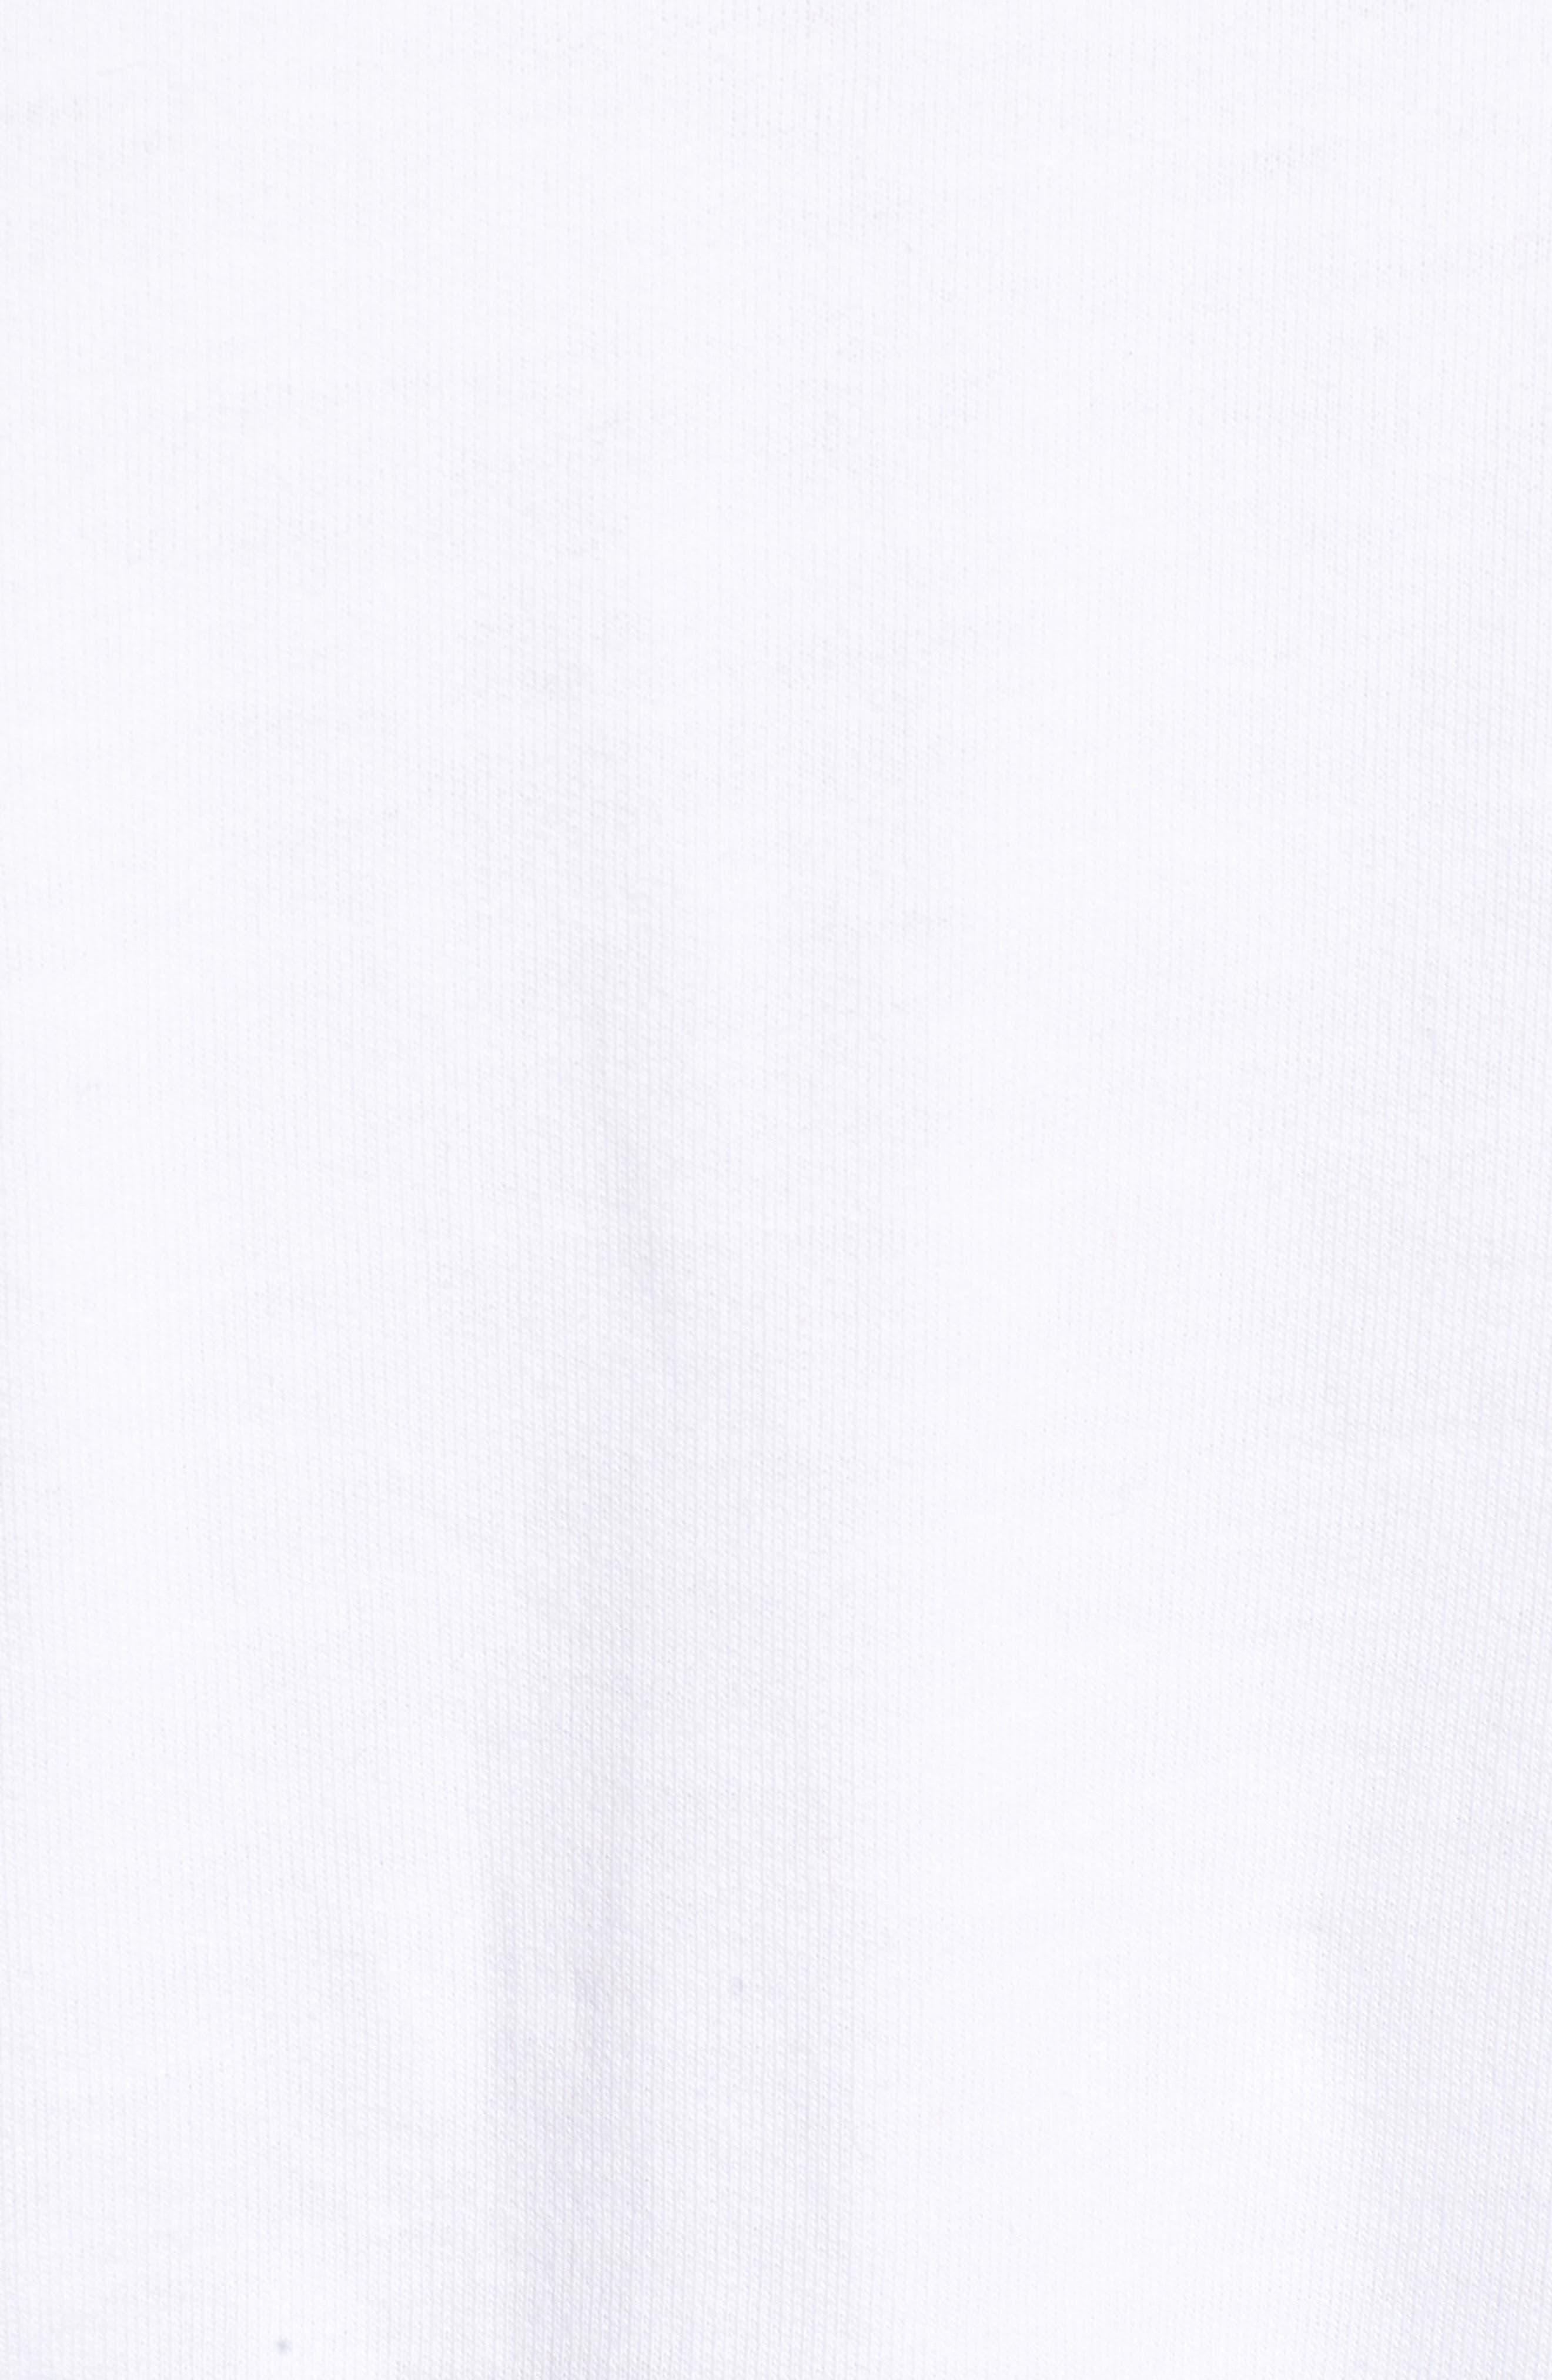 Bamm Bamm Crop Sweatshirt,                             Alternate thumbnail 19, color,